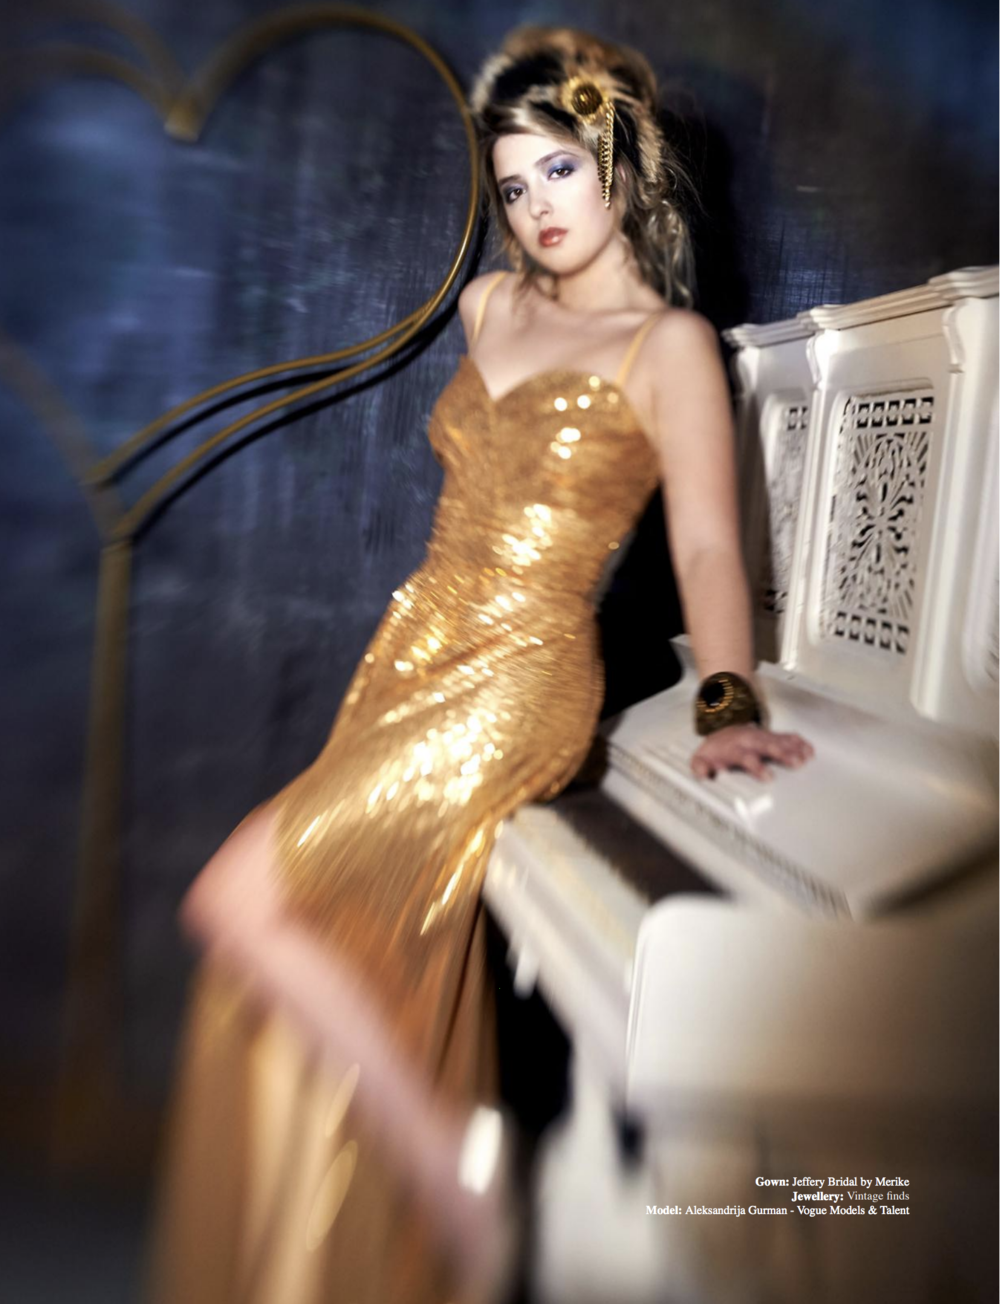 Marta-Hewson-Eluxe-Magazine-Vogue-Models-Torontoi-Fashion-Photography.png